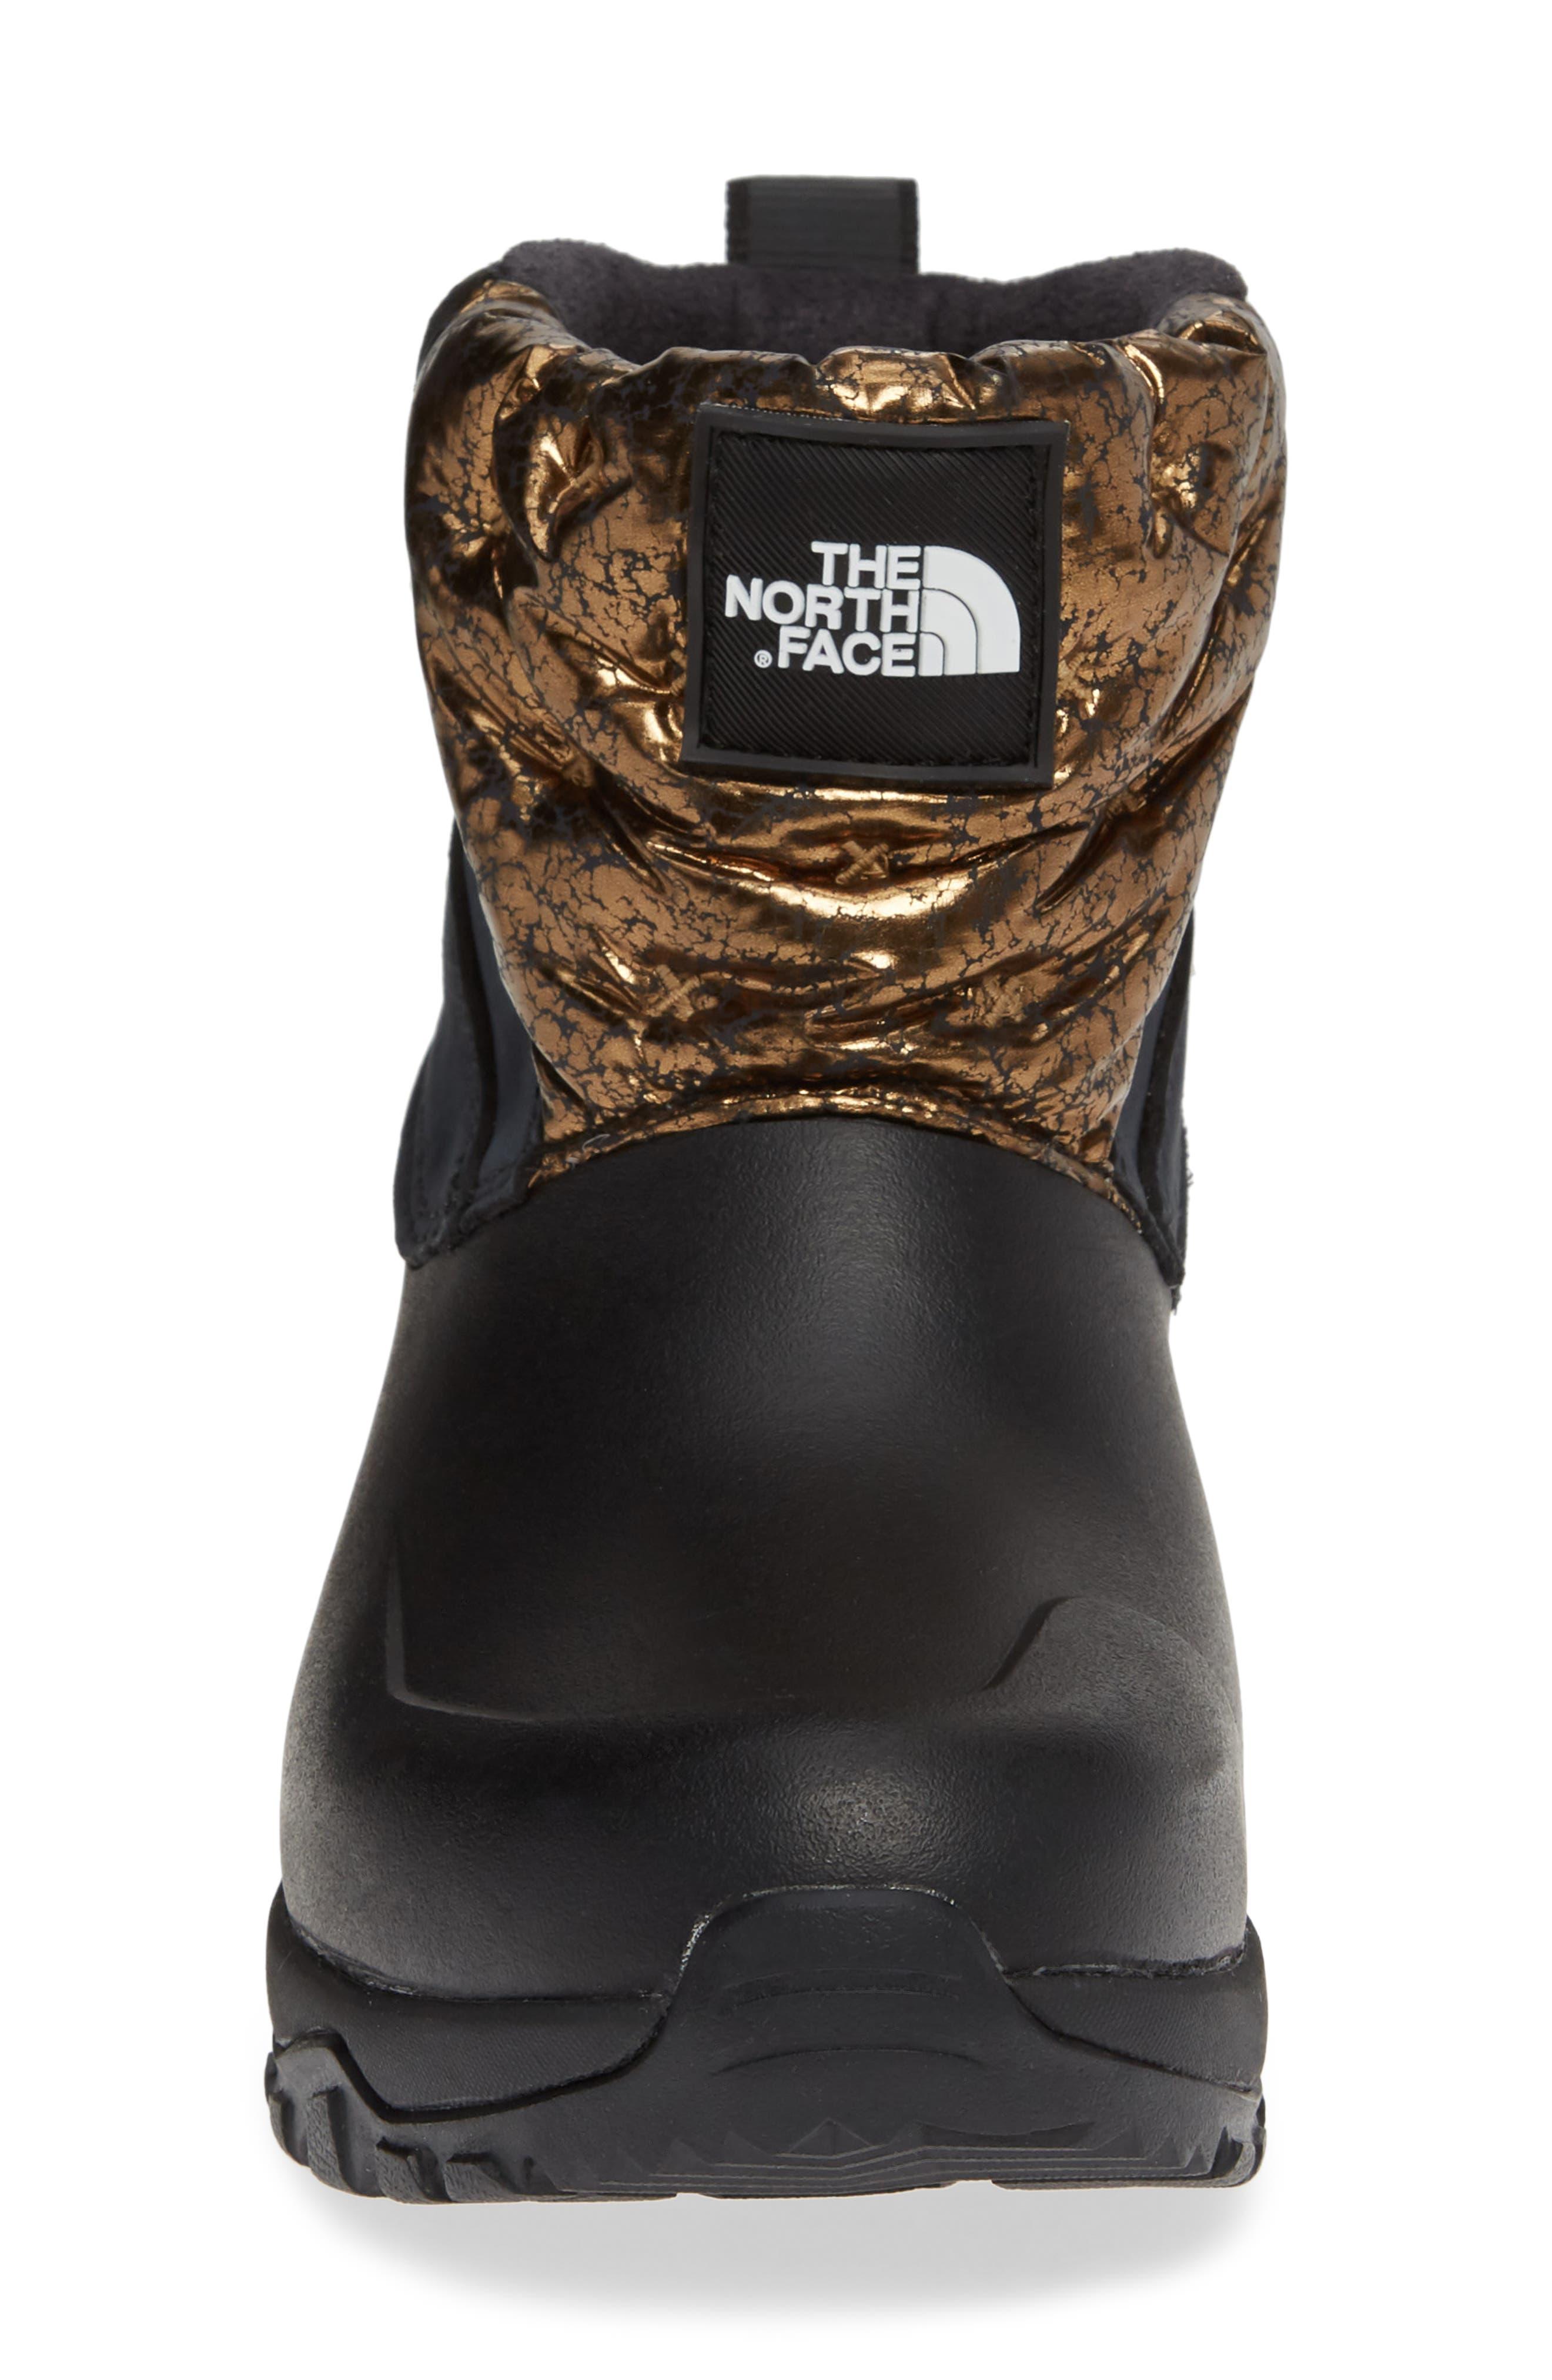 Yukiona Waterproof Ankle Boot,                             Alternate thumbnail 4, color,                             BLACK/ METALLIC COPPER